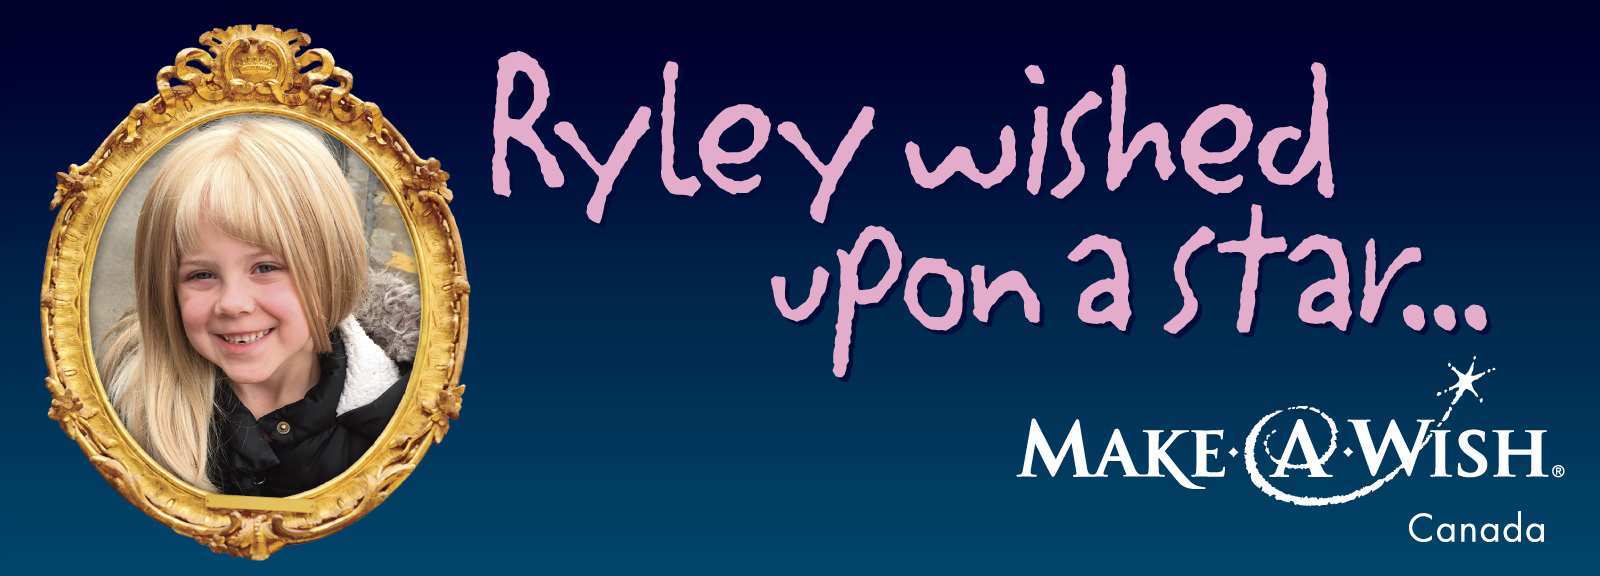 Make-A-WishCanada-Ryley'sWish